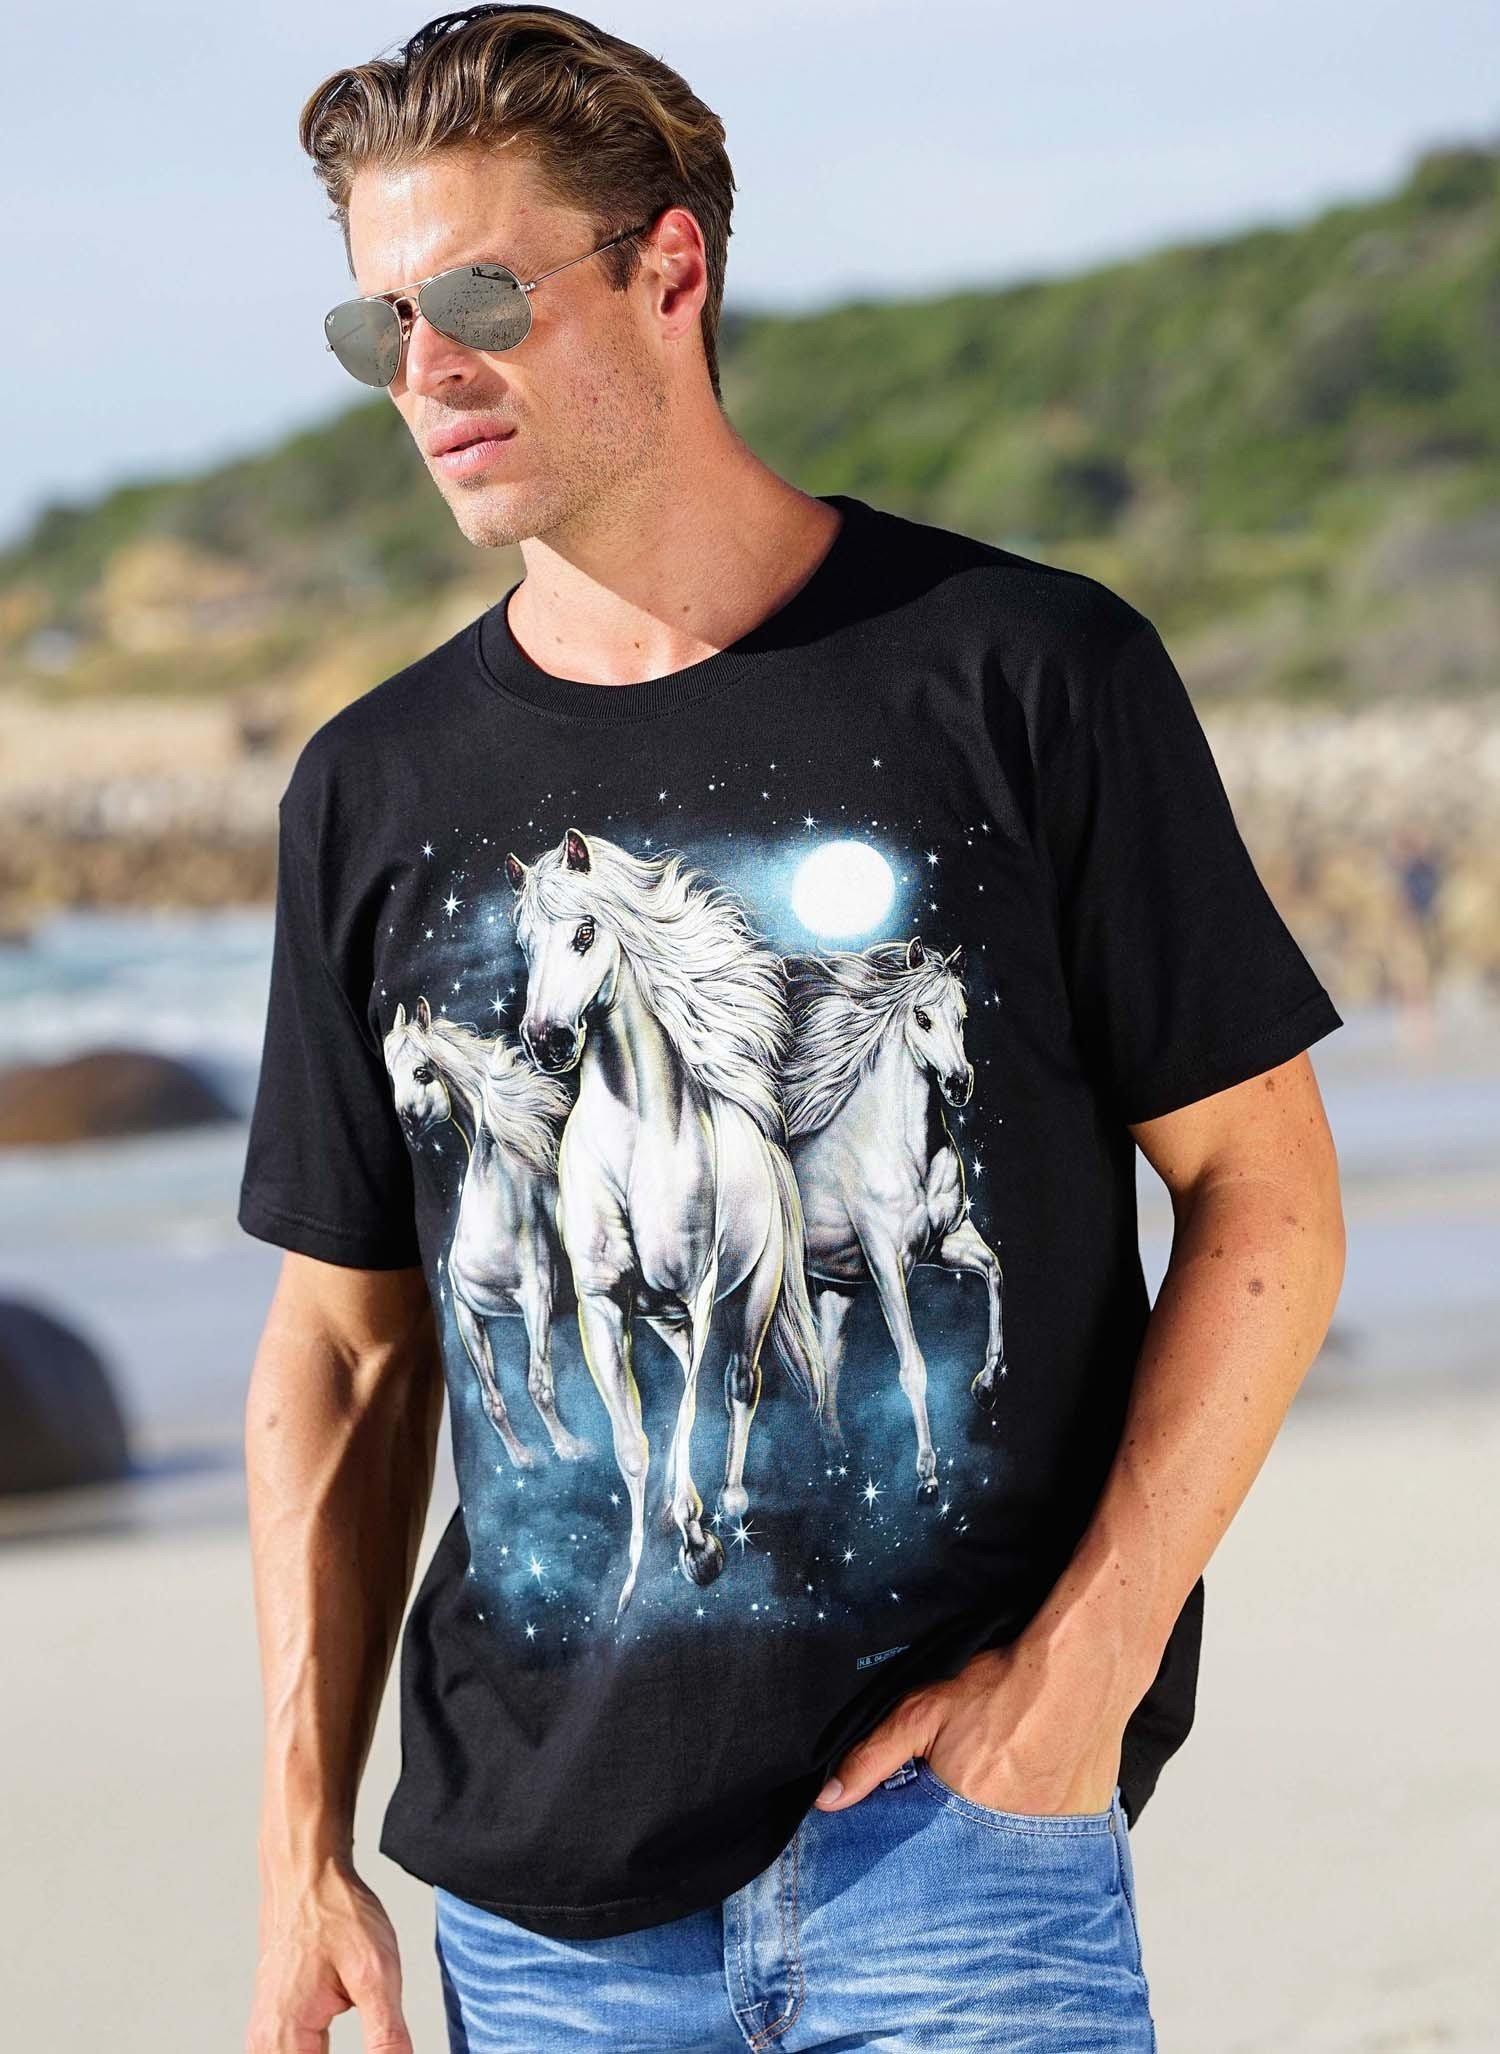 H-KA-Shirt,Print Pferde L 010 - 1 - Ronja.ch